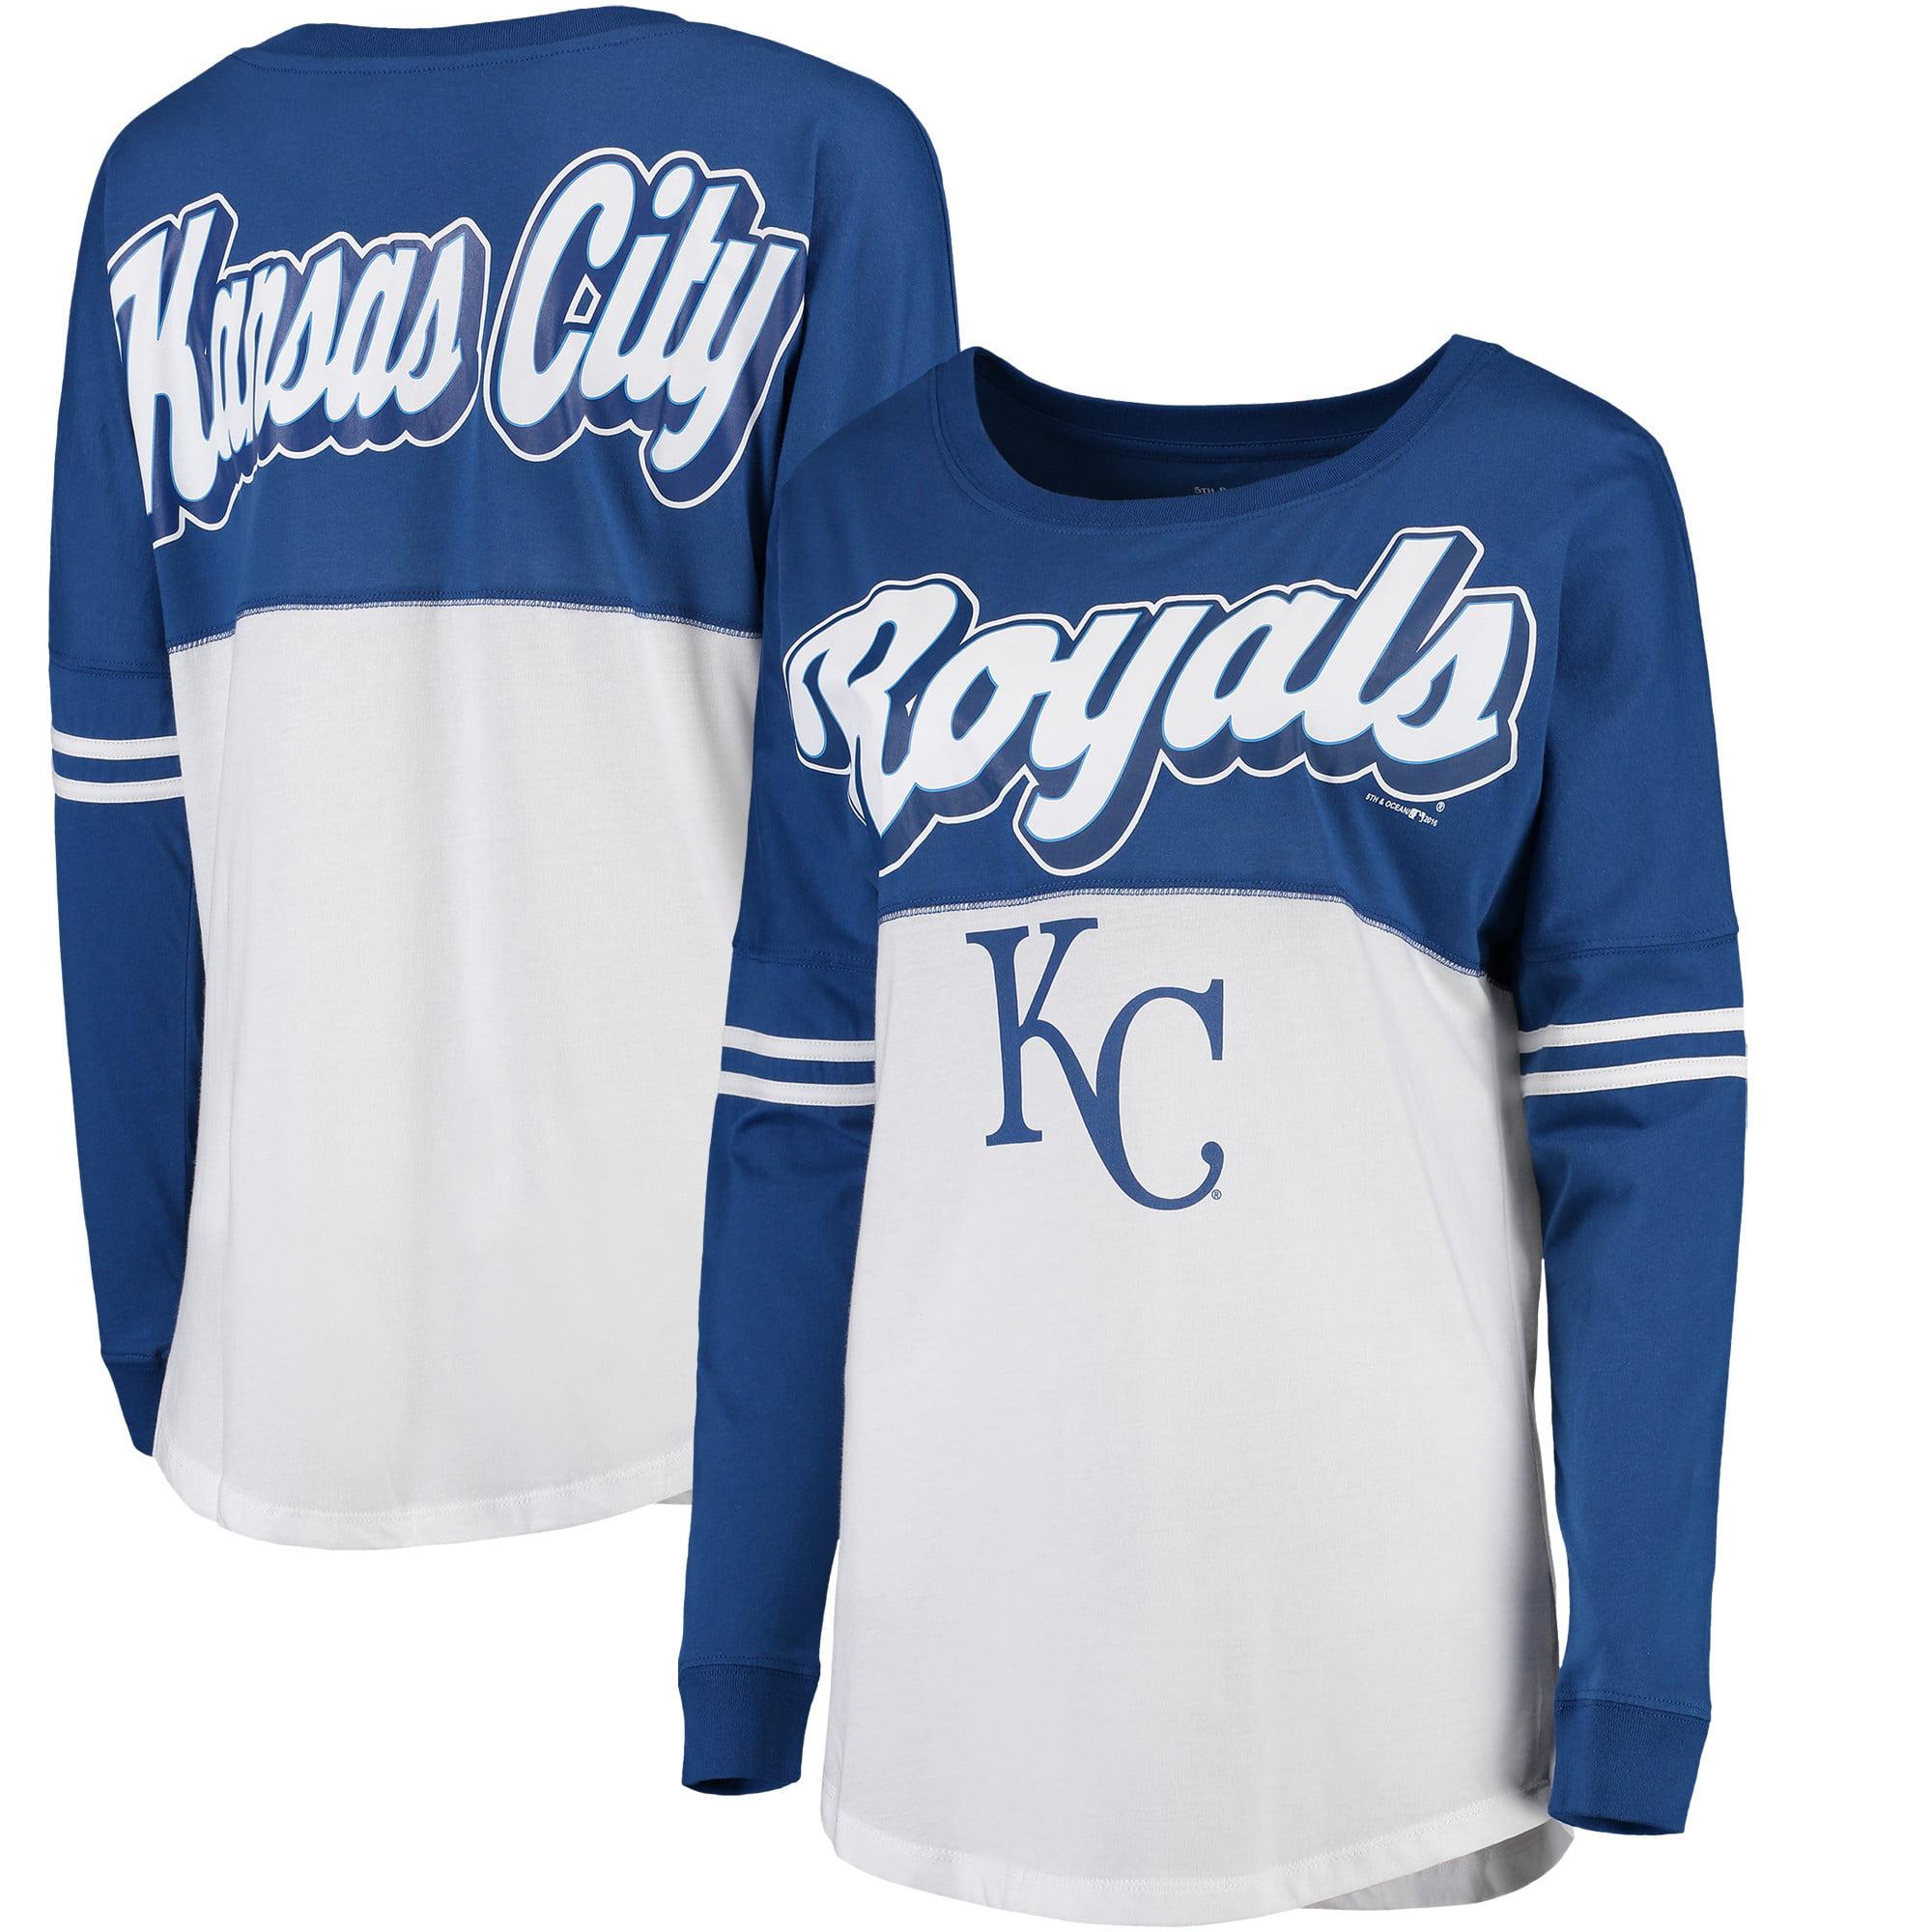 Kansas City Royals 5th & Ocean by New Era Women's MLB Baby Jersey Varsity Crew Boyfriend Long Sleeve T-Shirt - White